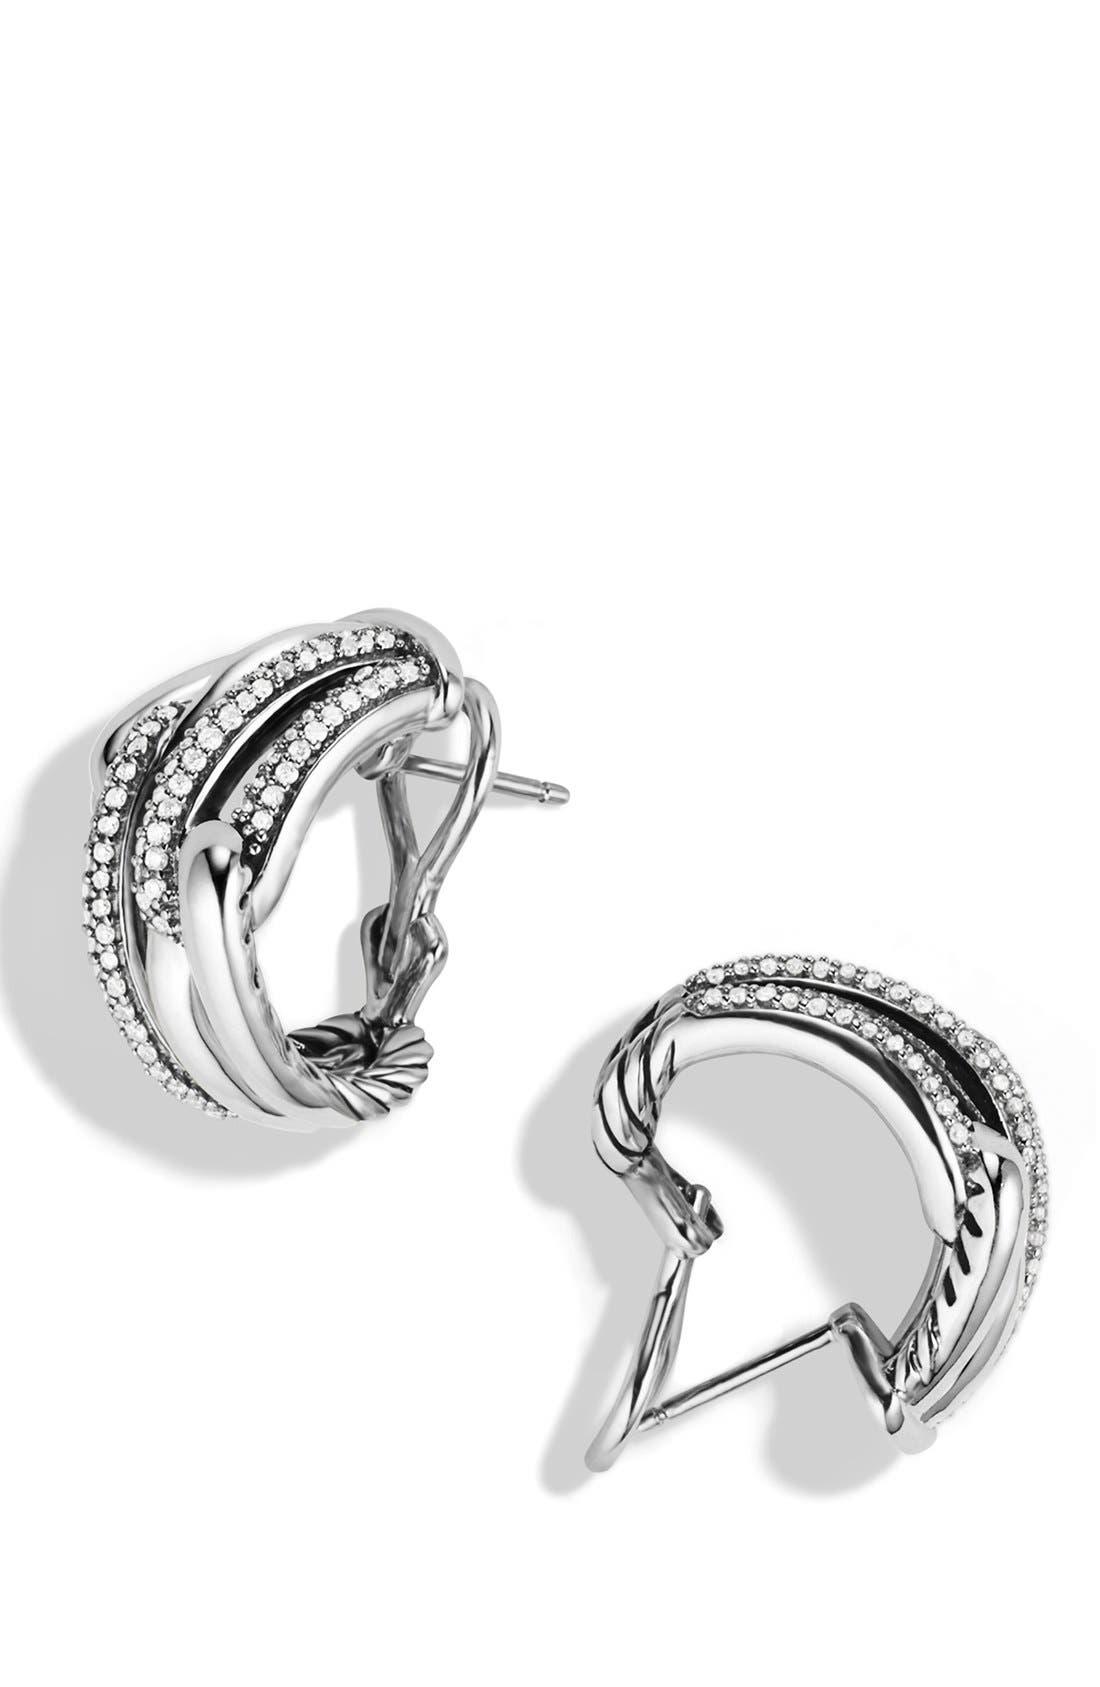 Alternate Image 2  - David Yurman 'Labyrinth' Double Loop Earrings with Diamonds